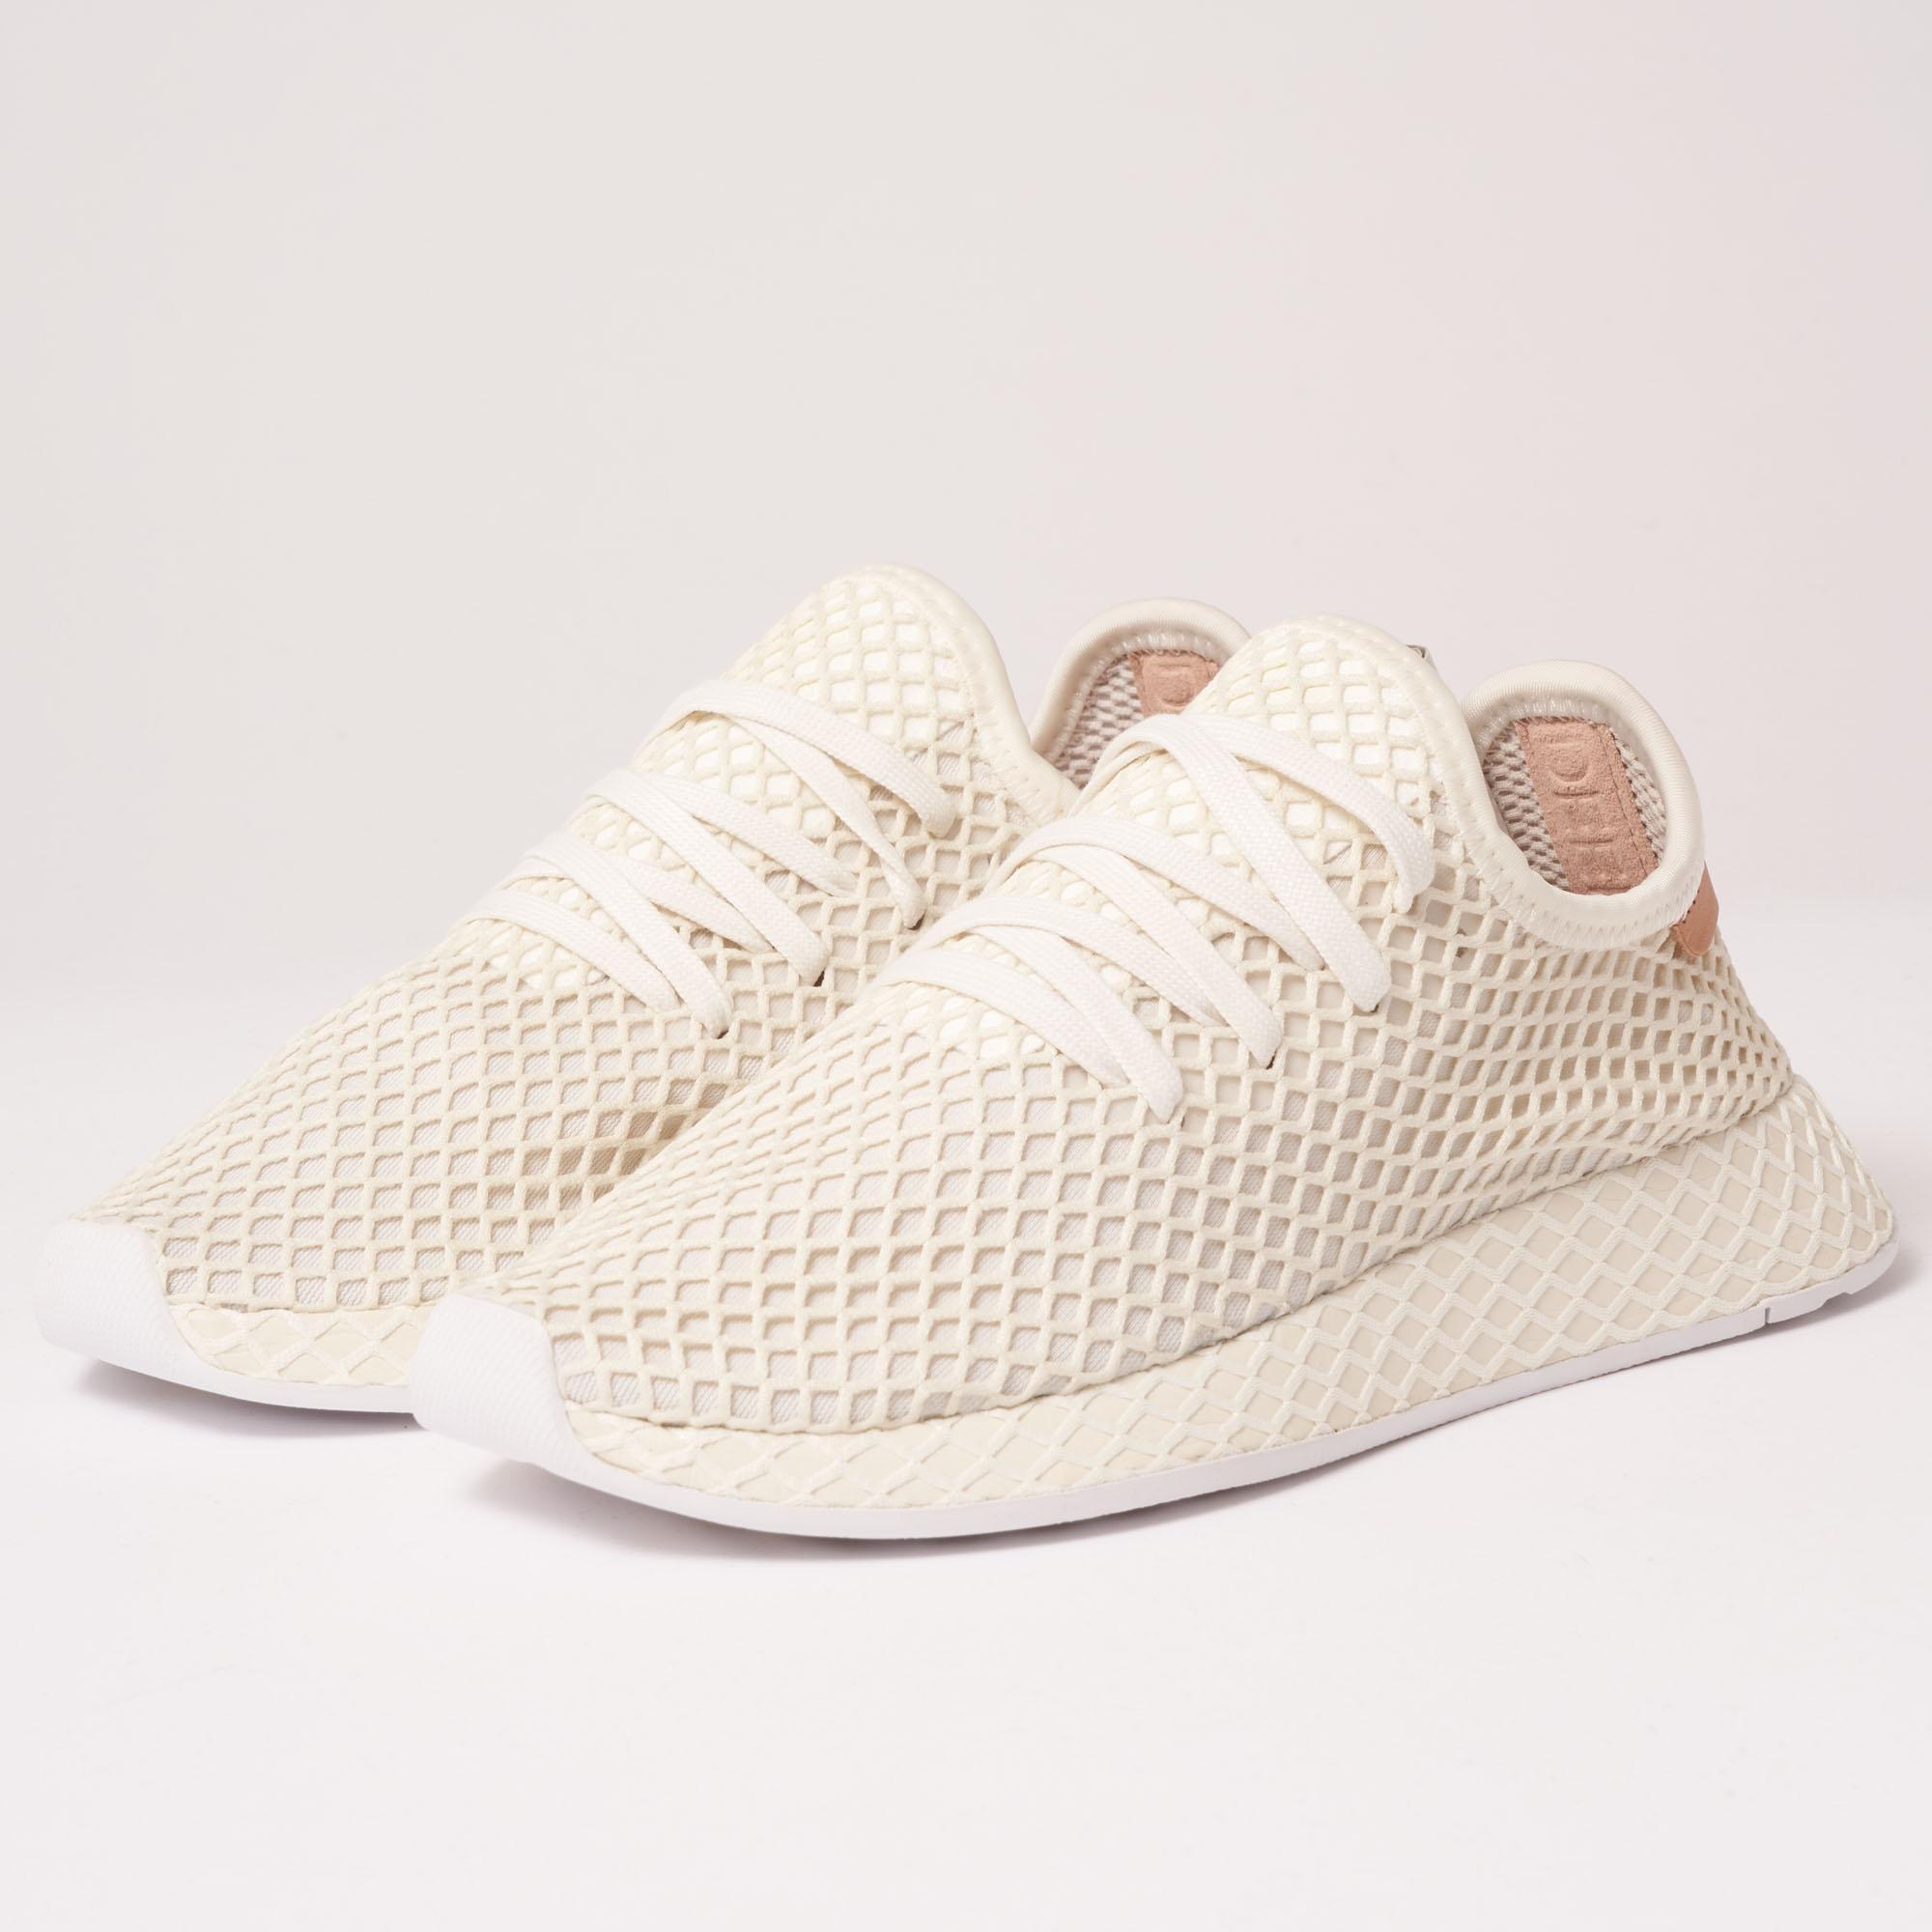 size 40 e3911 728e2 adidas Originals Deerupt Runner - Cloud White, Ash Pearl   Ftwr ...